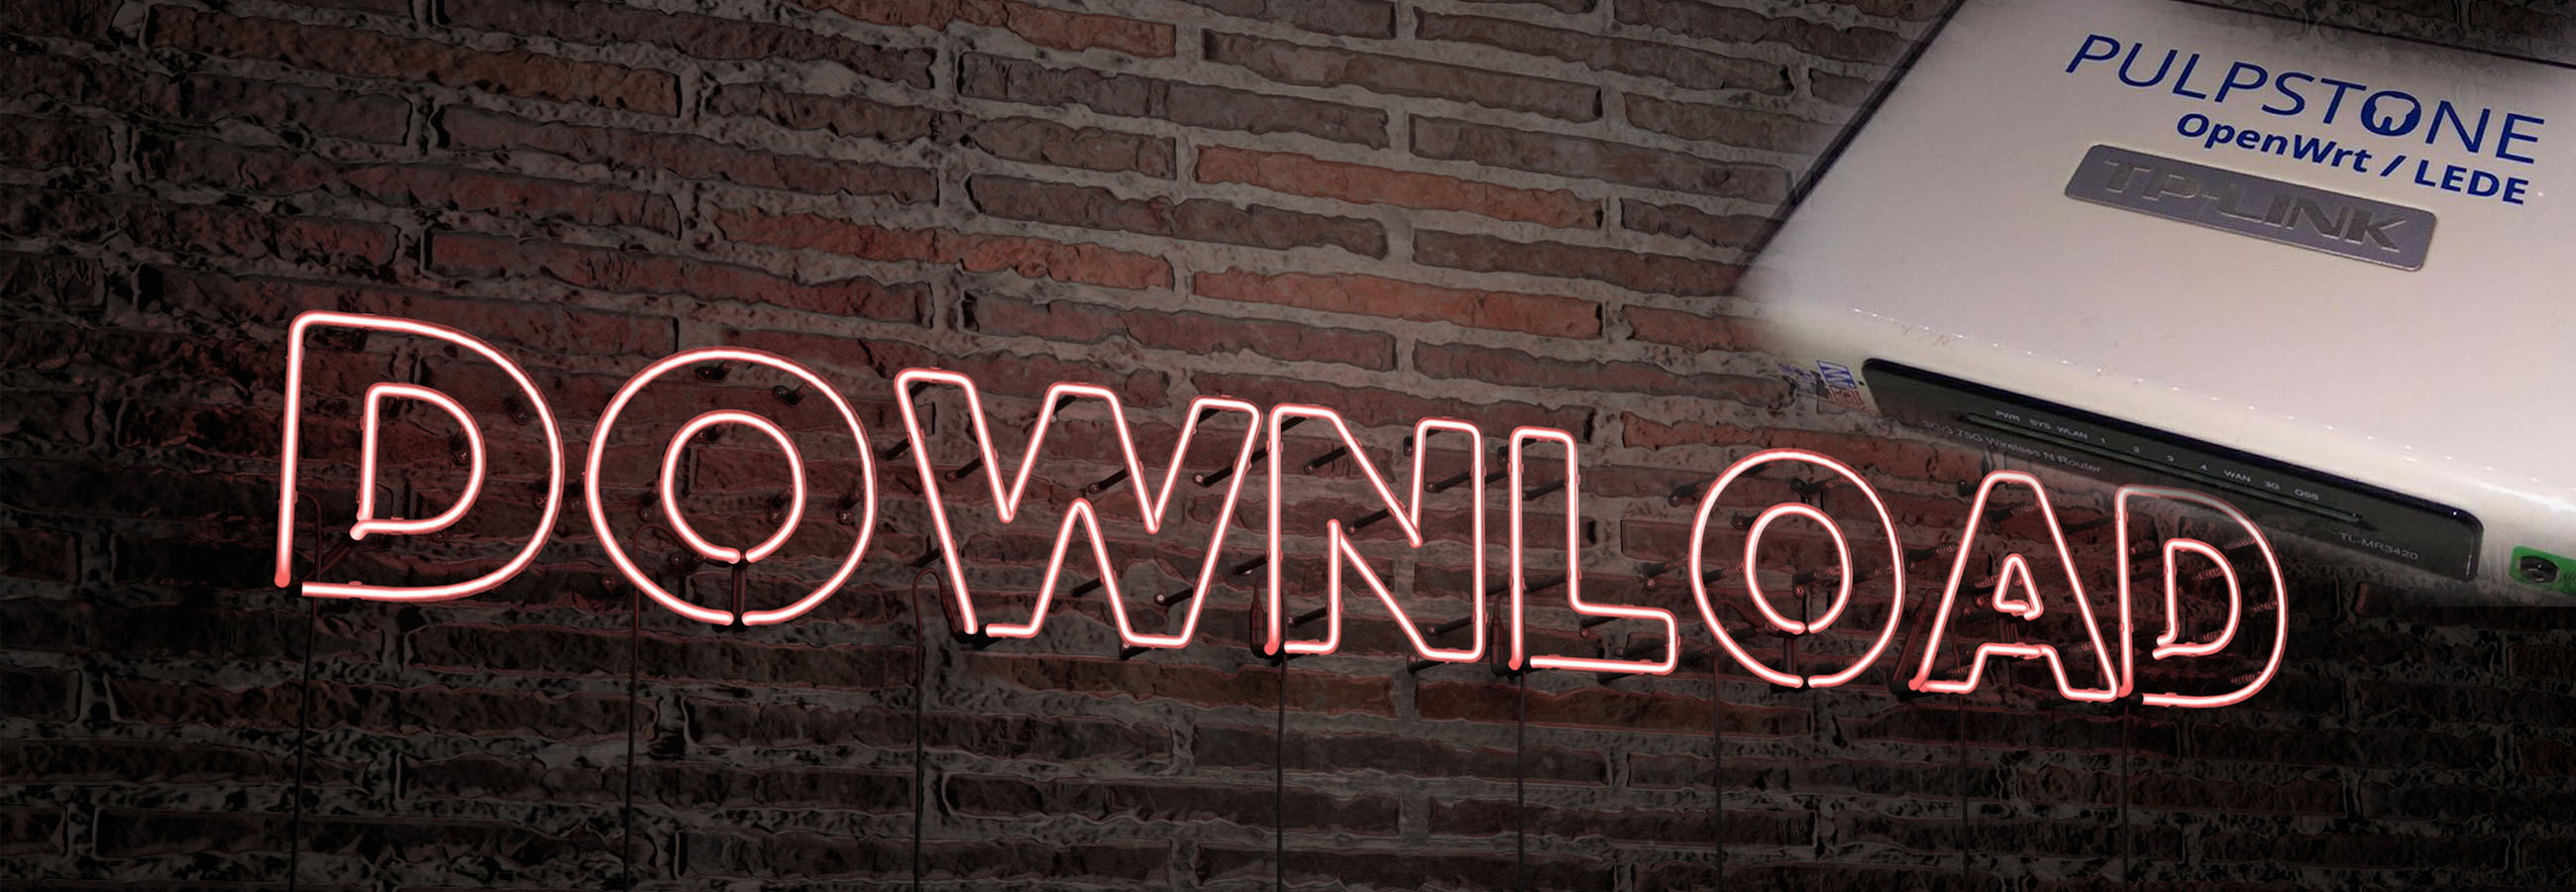 Downloads   Pulpstone OpenWrt - LEDE